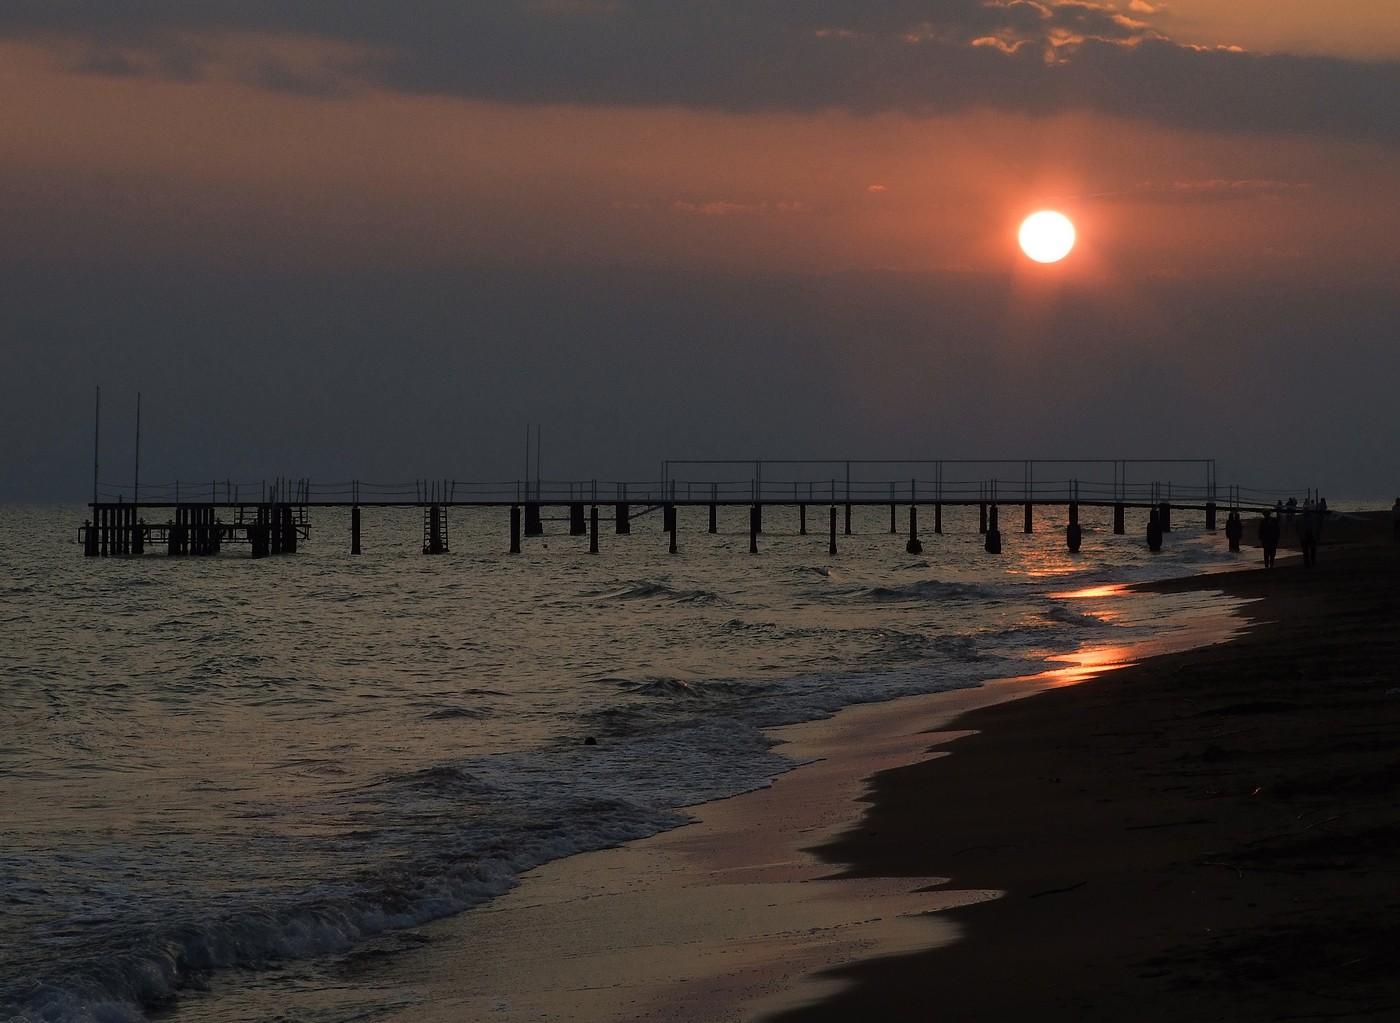 Geheimnisvoller Strand